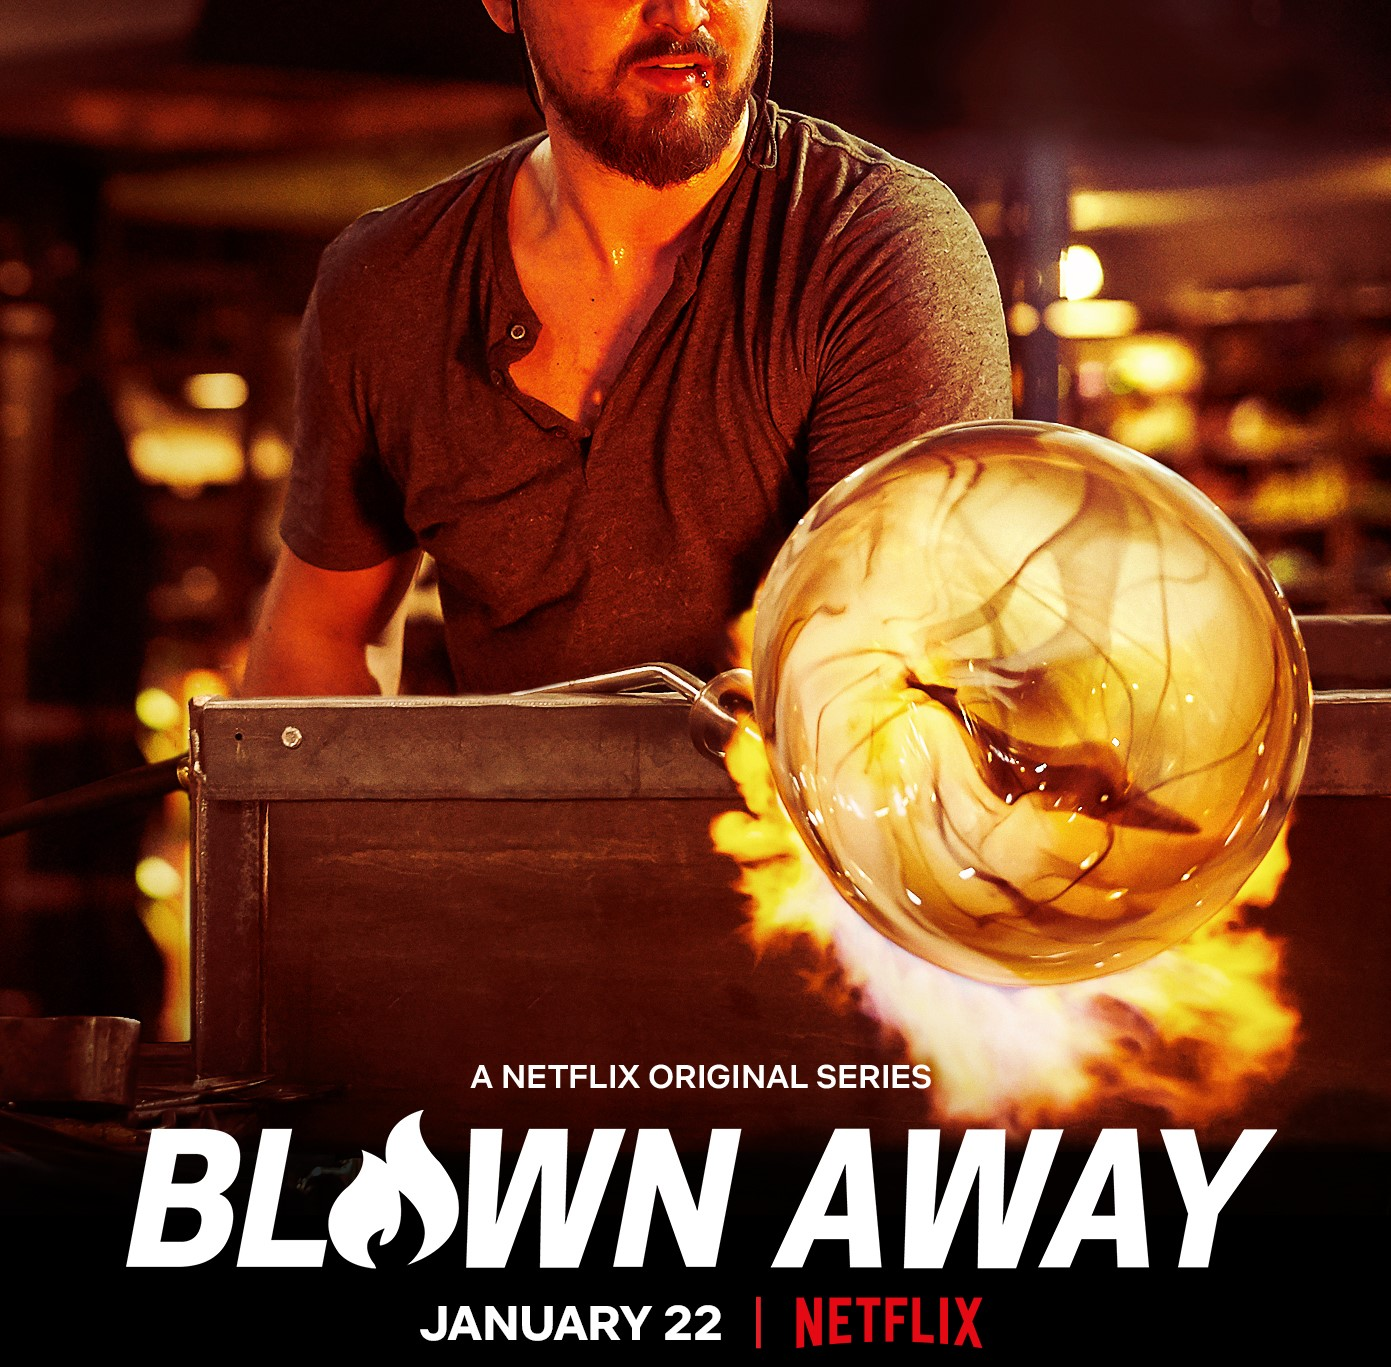 Elliot Walker - Netflix Blown Away